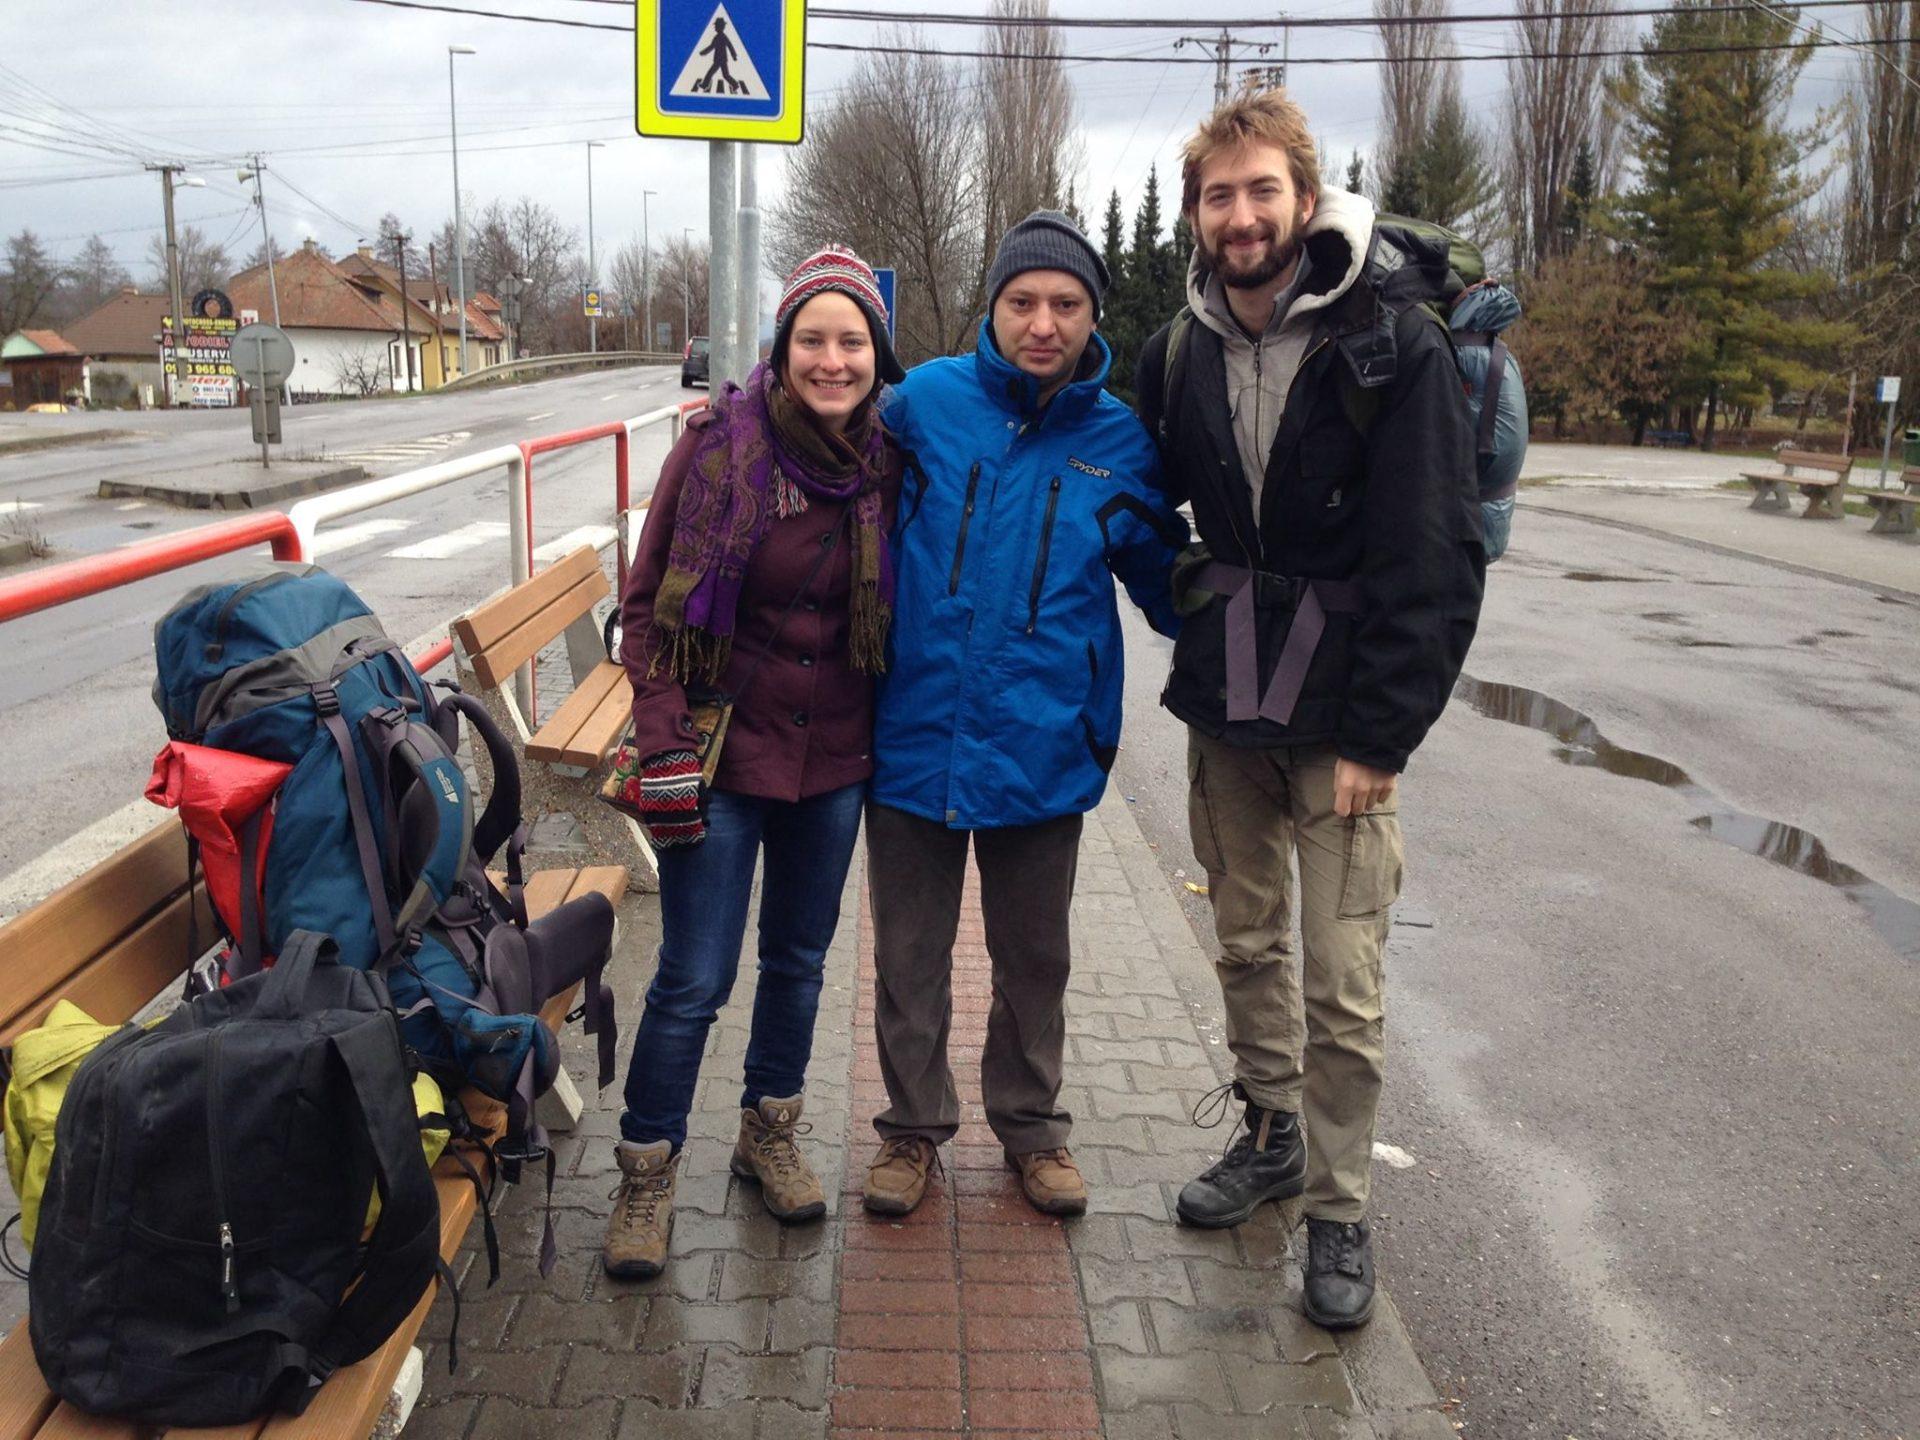 Ashleigh, Lubomir, and Nathanael in Slovakia